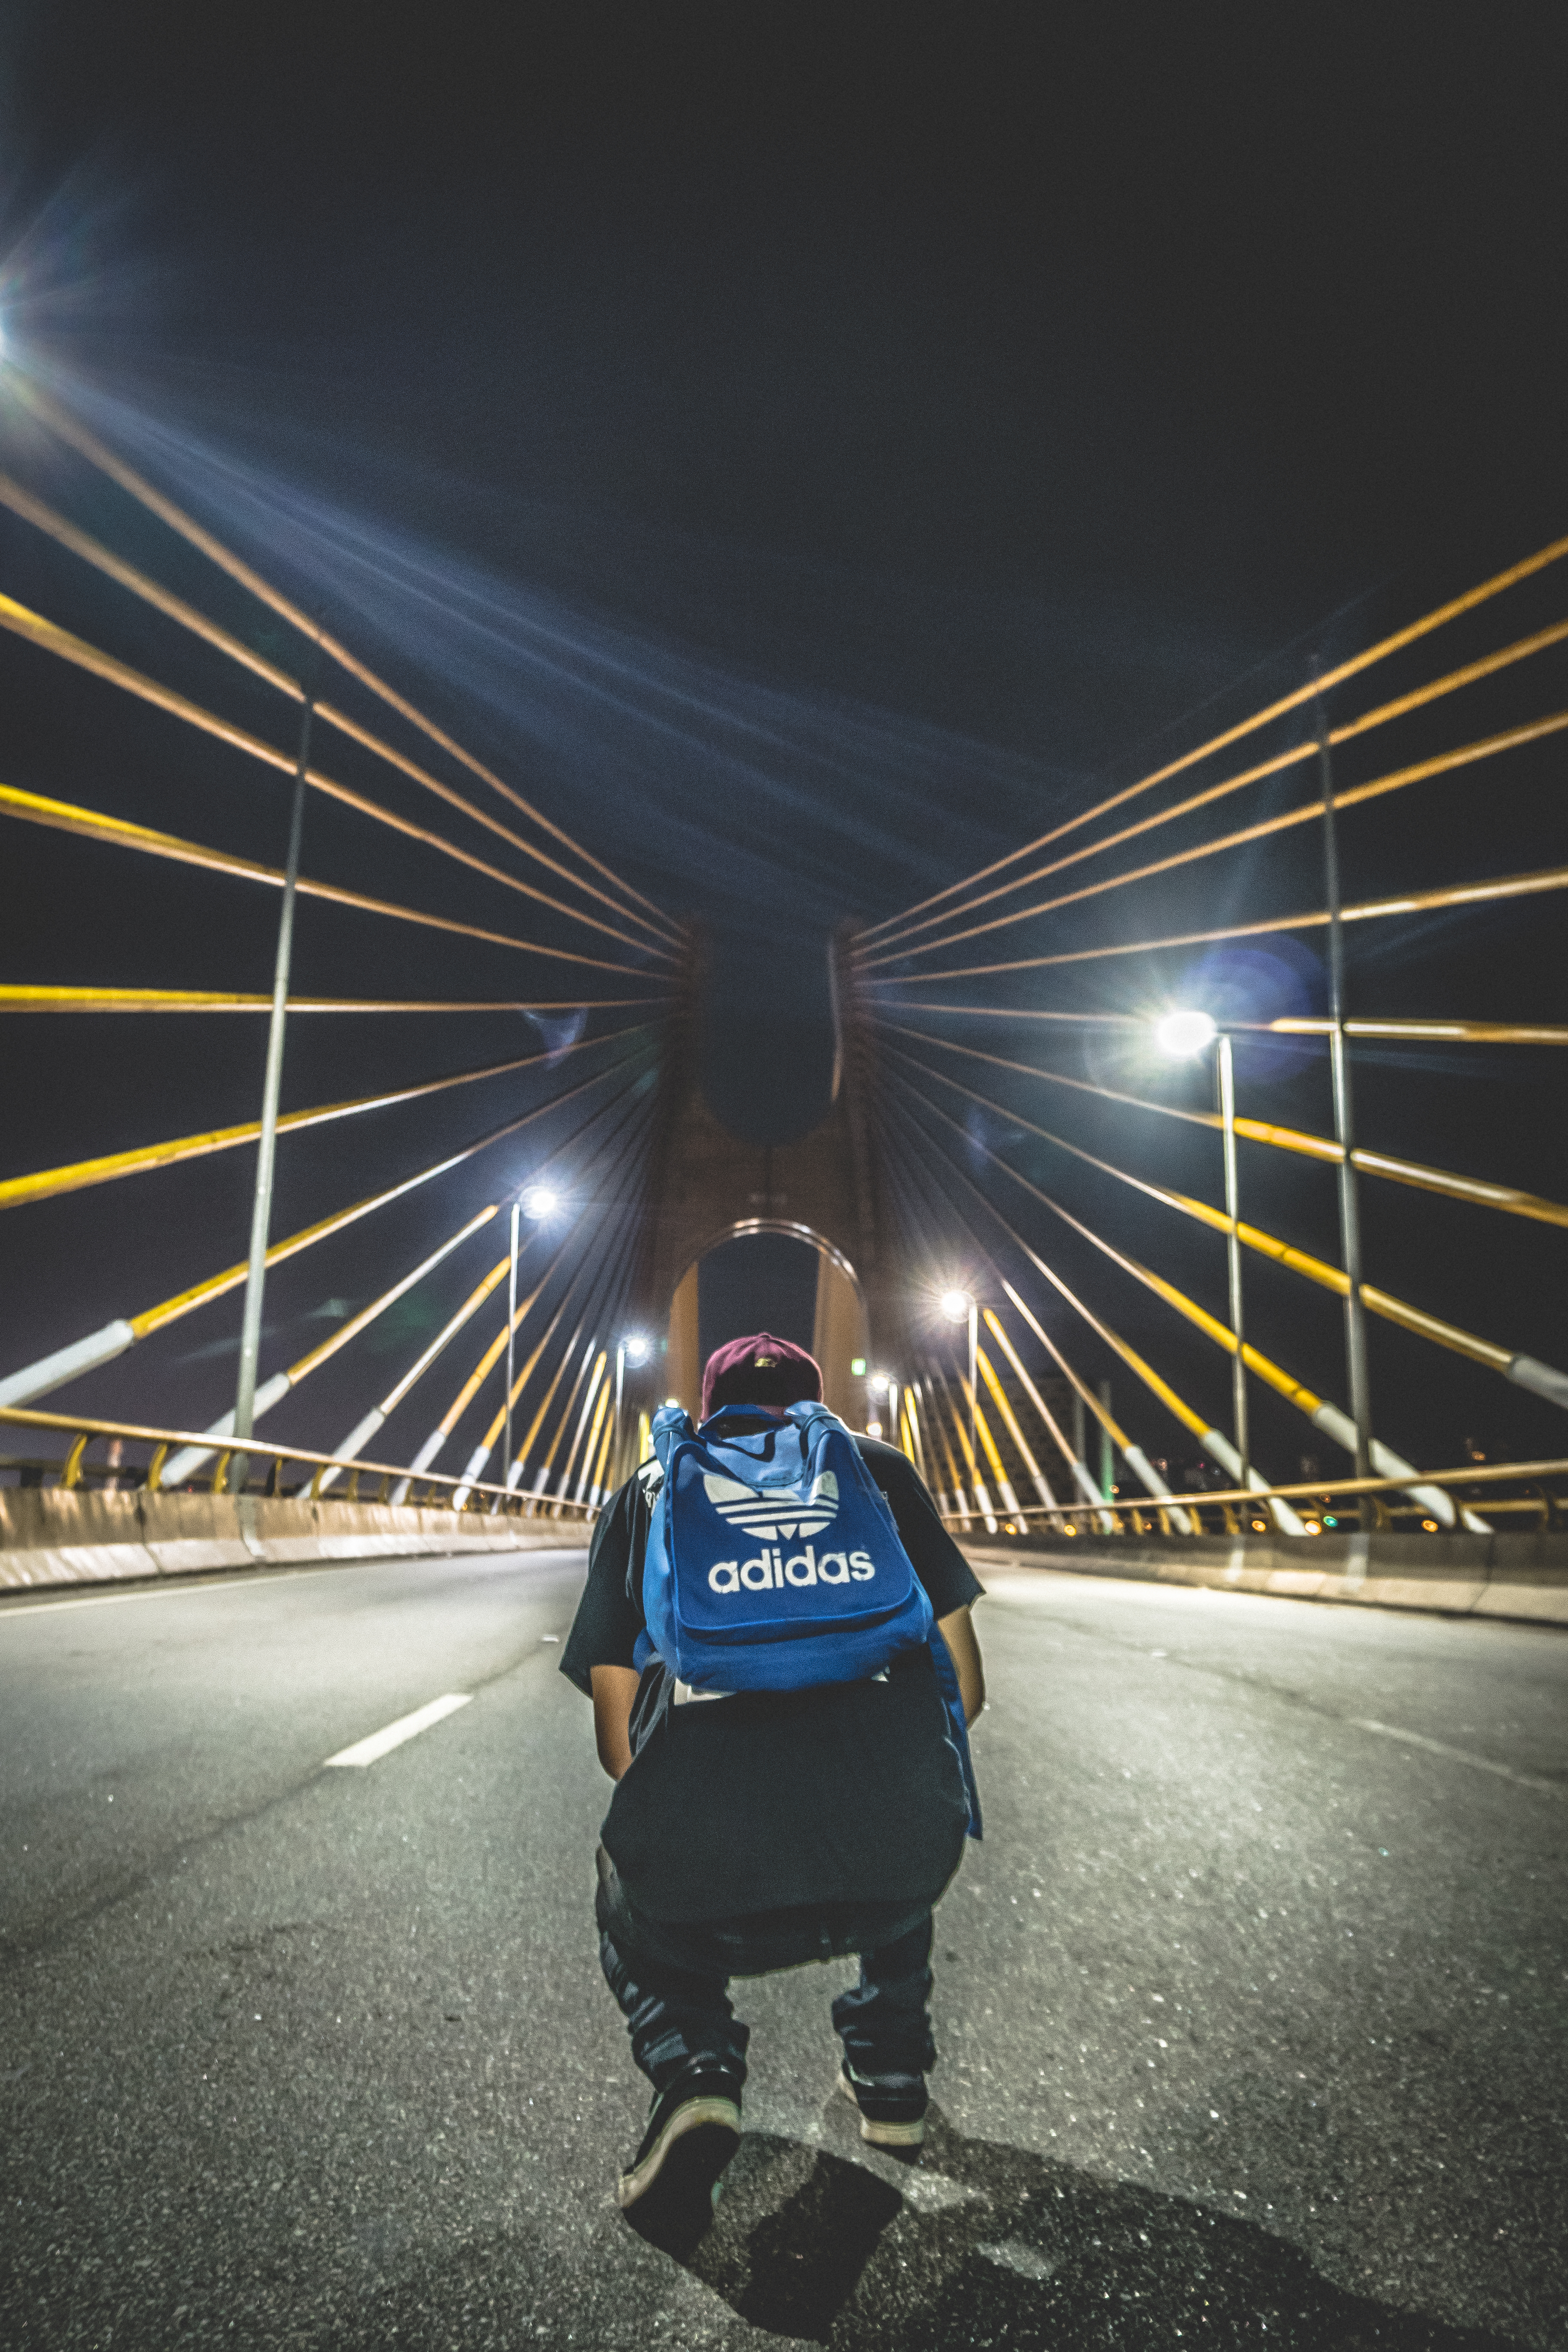 camiseta mundial 2018 mexico adidas